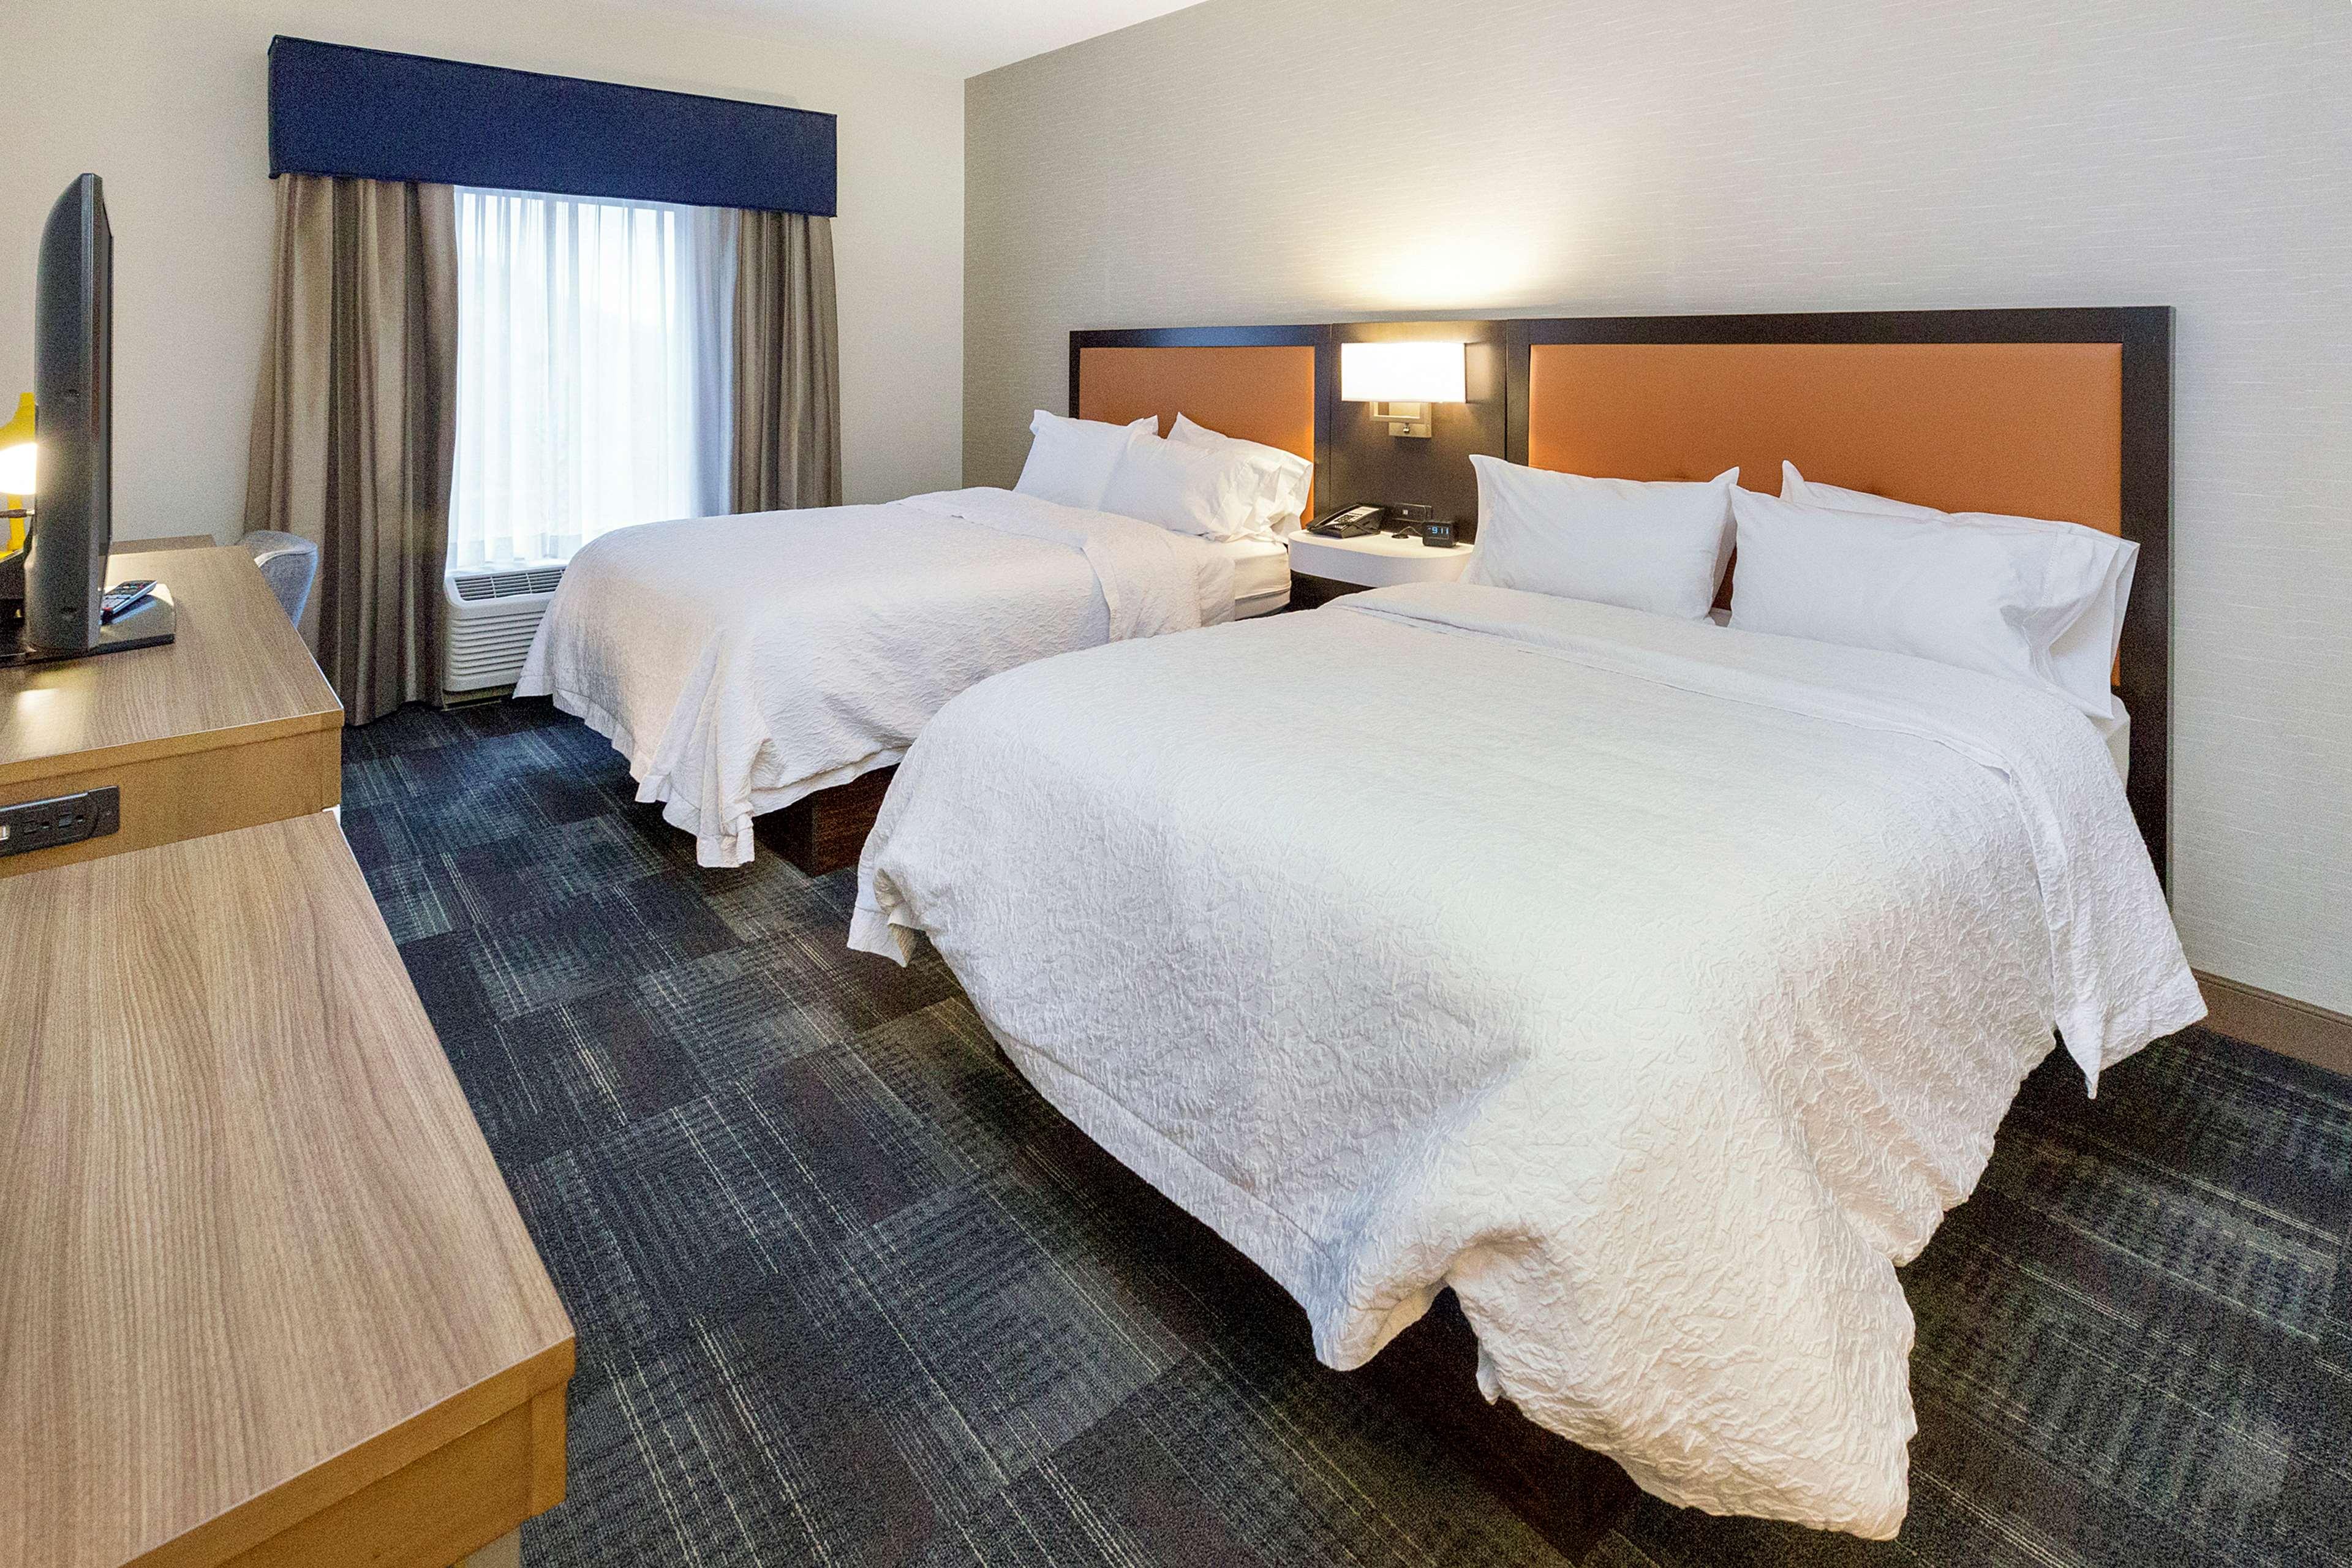 Hampton Inn & Suites Morgantown / University Town Centre image 20